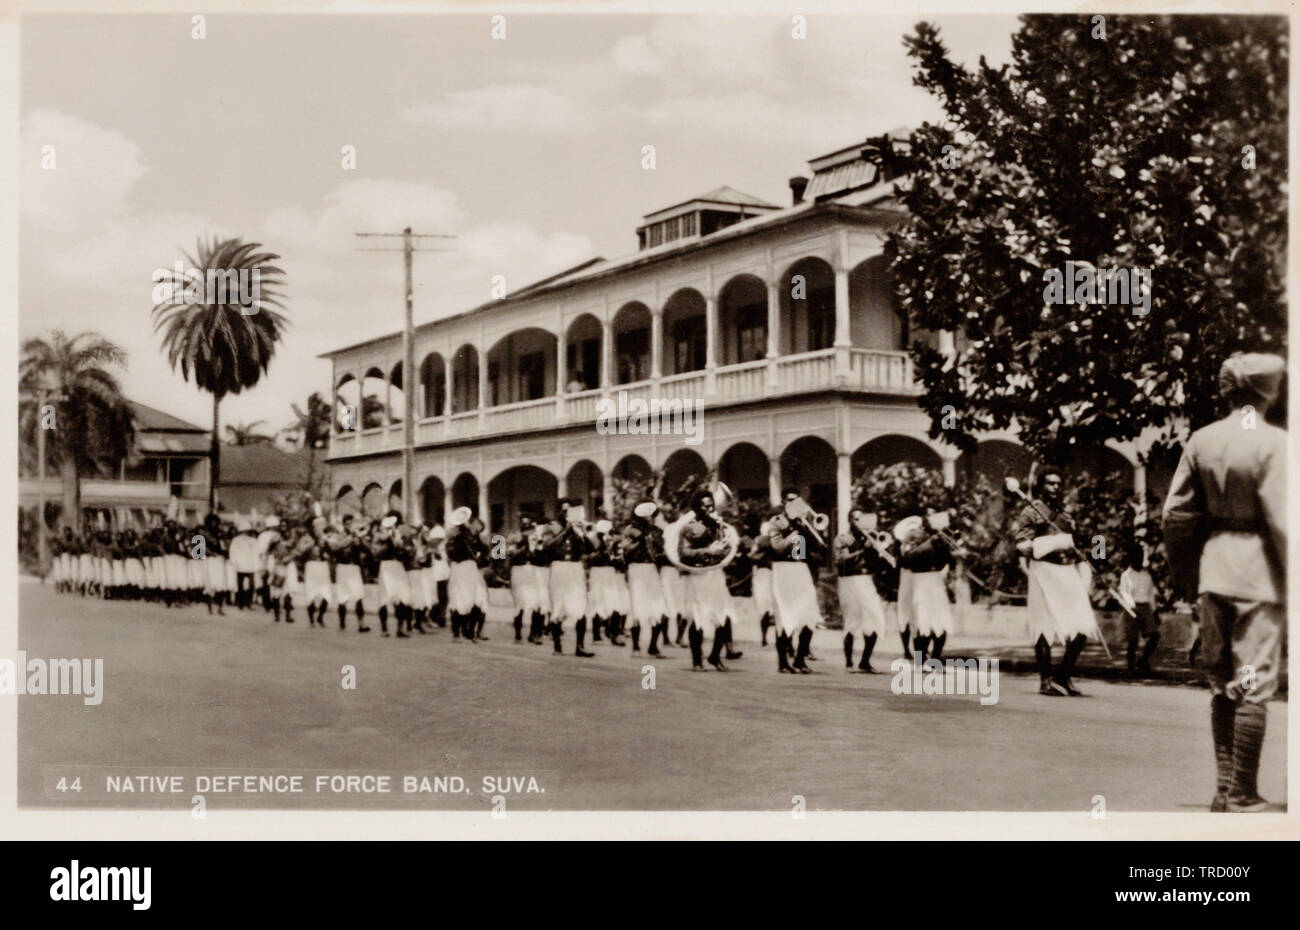 Early 1900s Postcard Stock Photos & Early 1900s Postcard